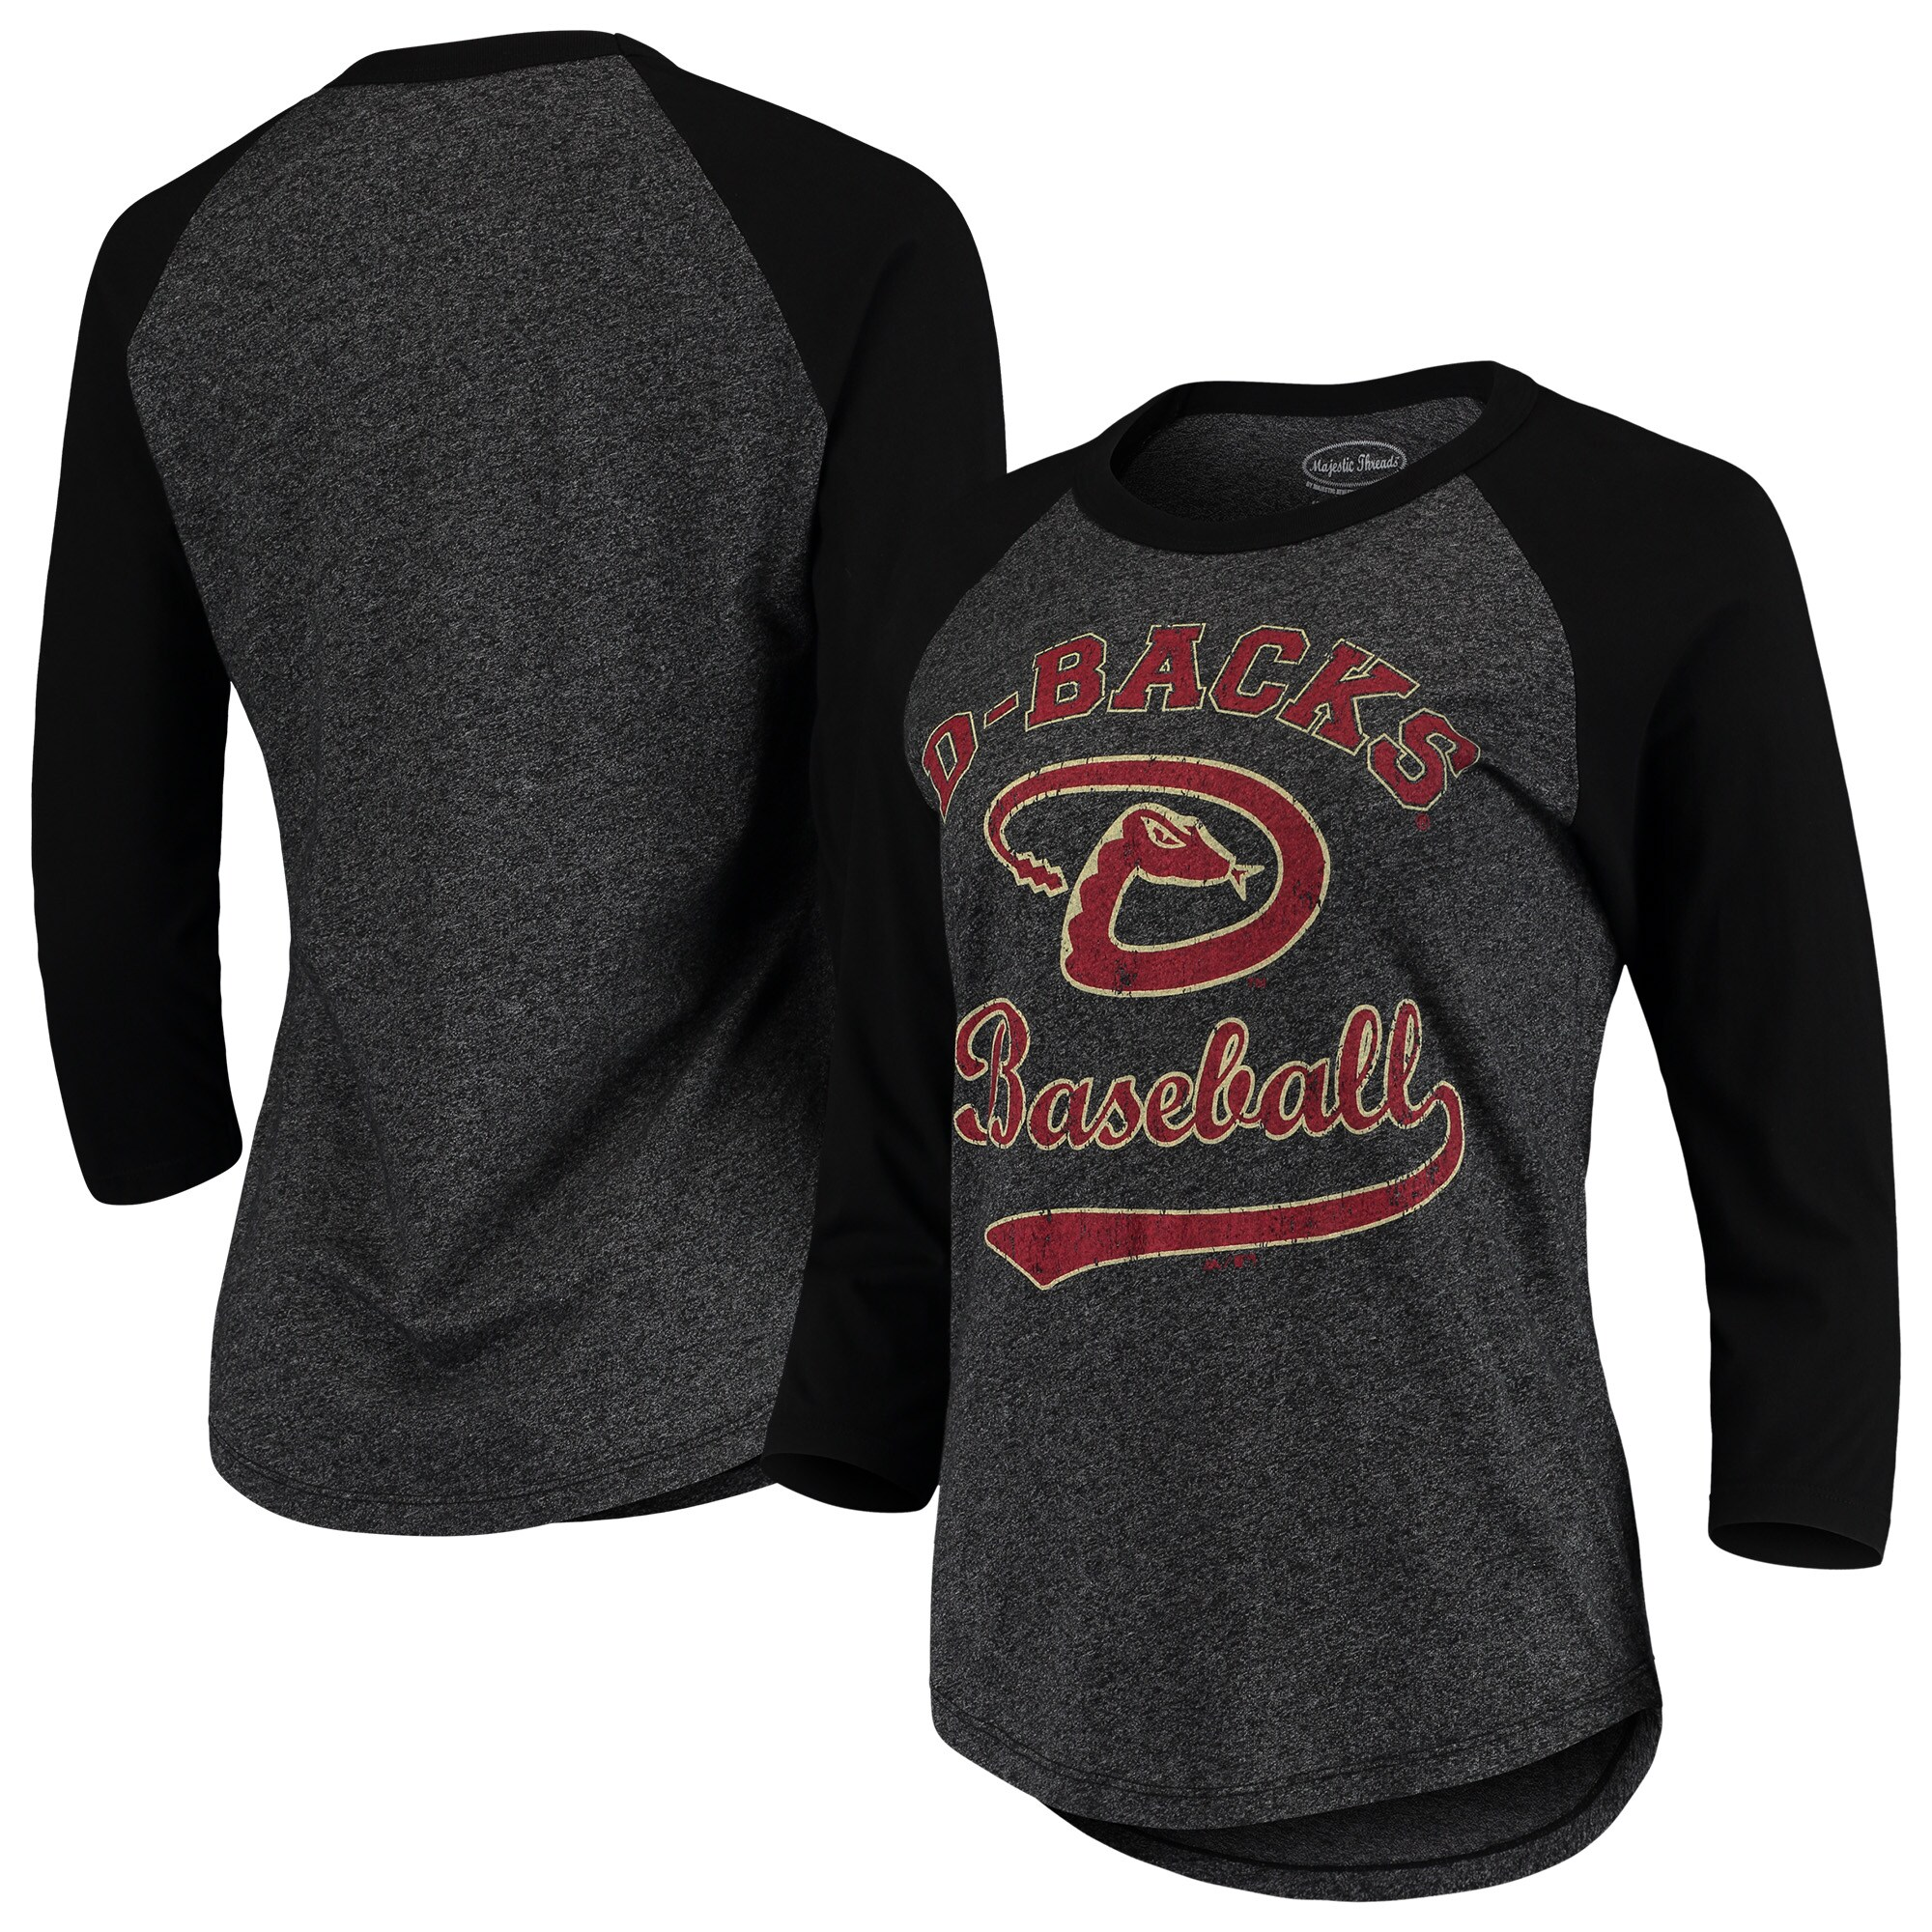 Arizona Diamondbacks Majestic Threads Women's Team Baseball Three-Quarter Raglan Sleeve Tri-Blend T-Shirt - Black